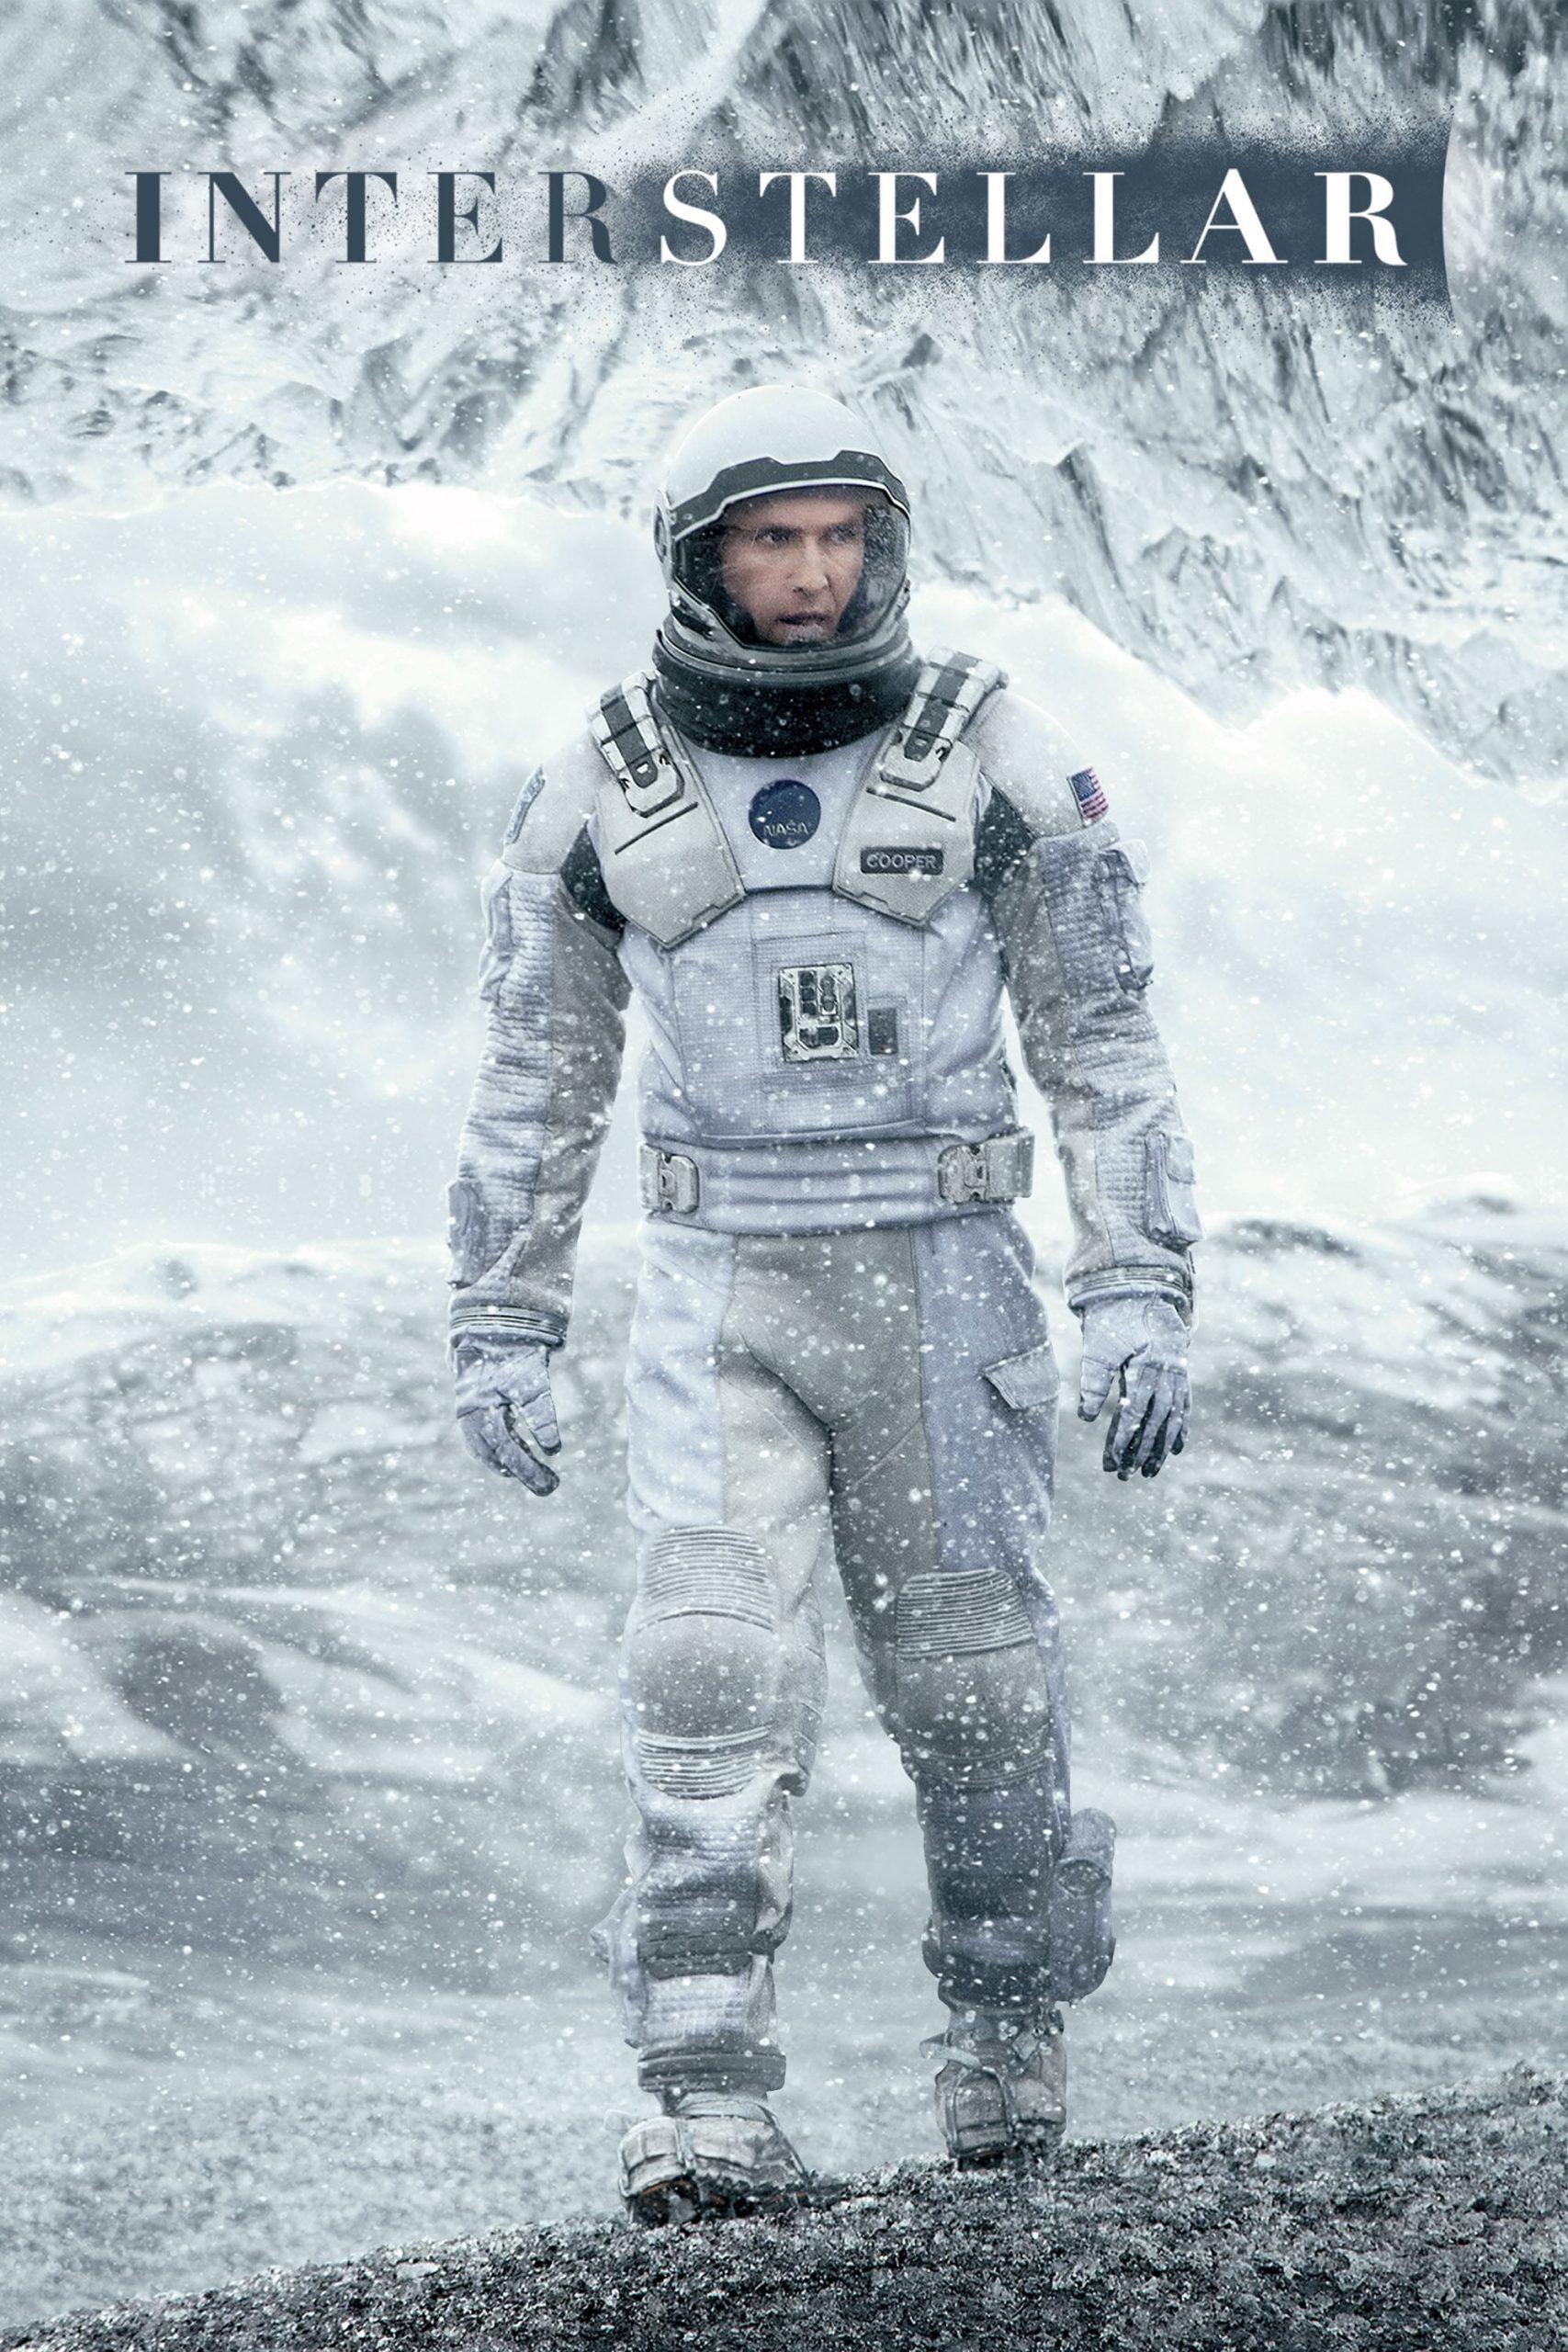 Poster for Interstellar (2014)